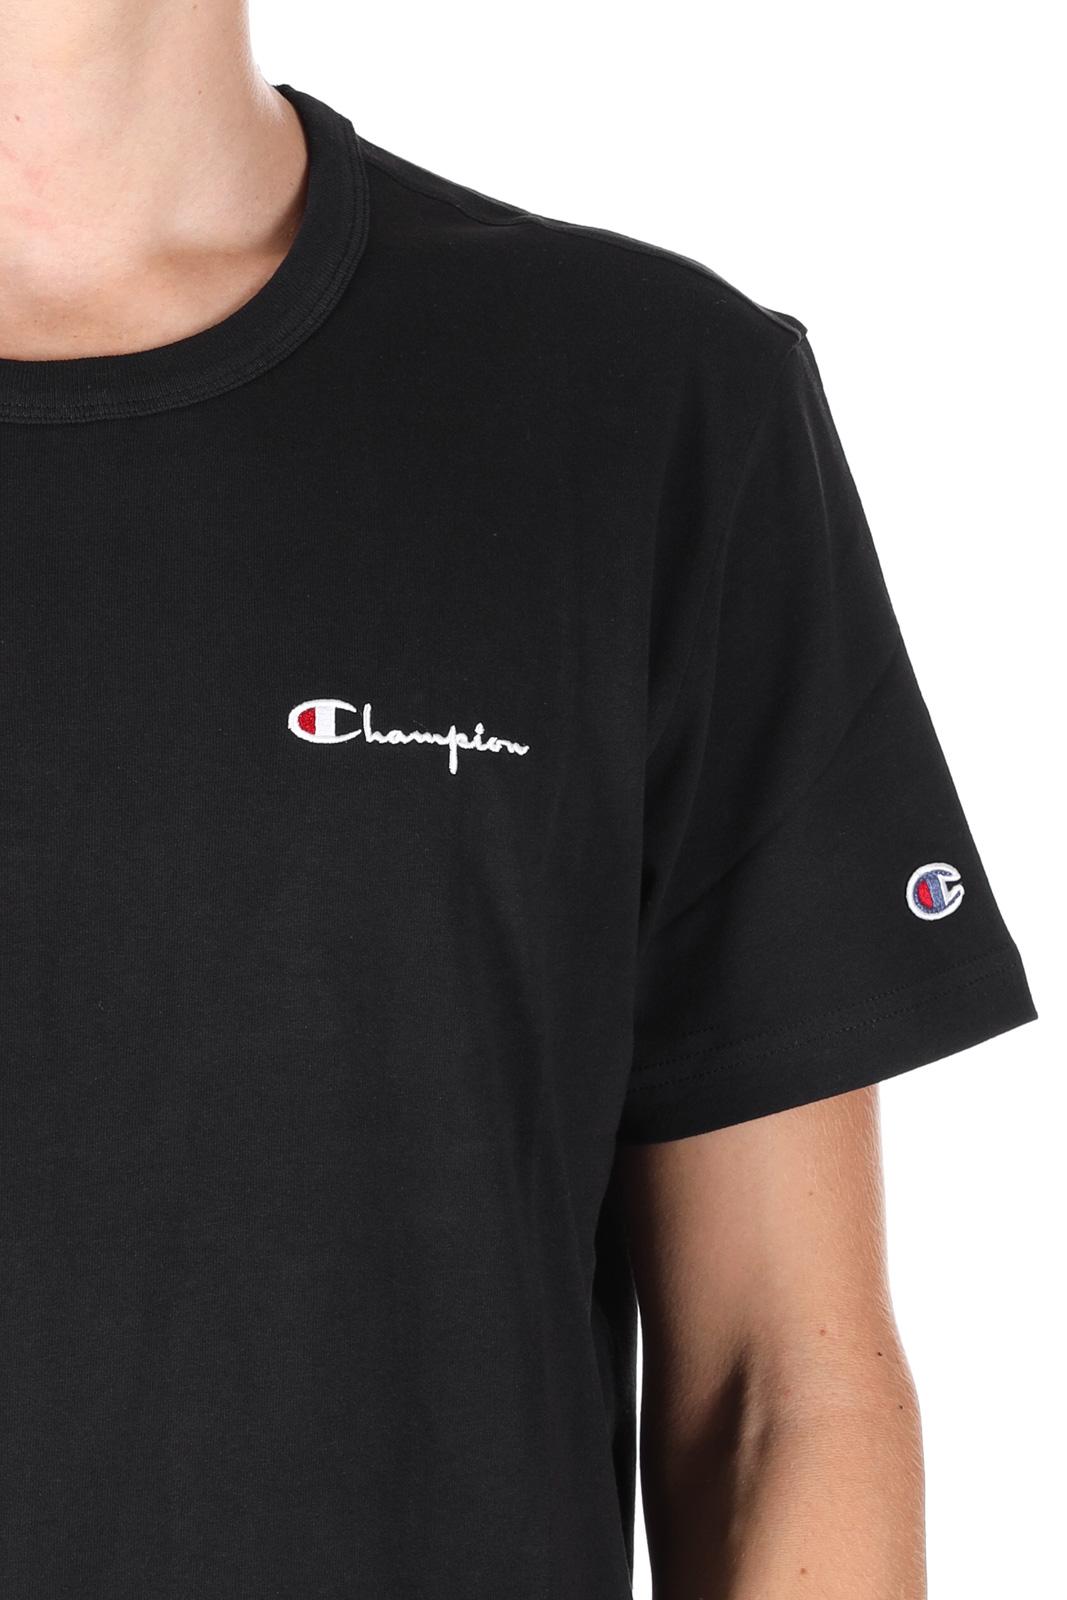 CHAMPION | T-shirt | 211985KK001